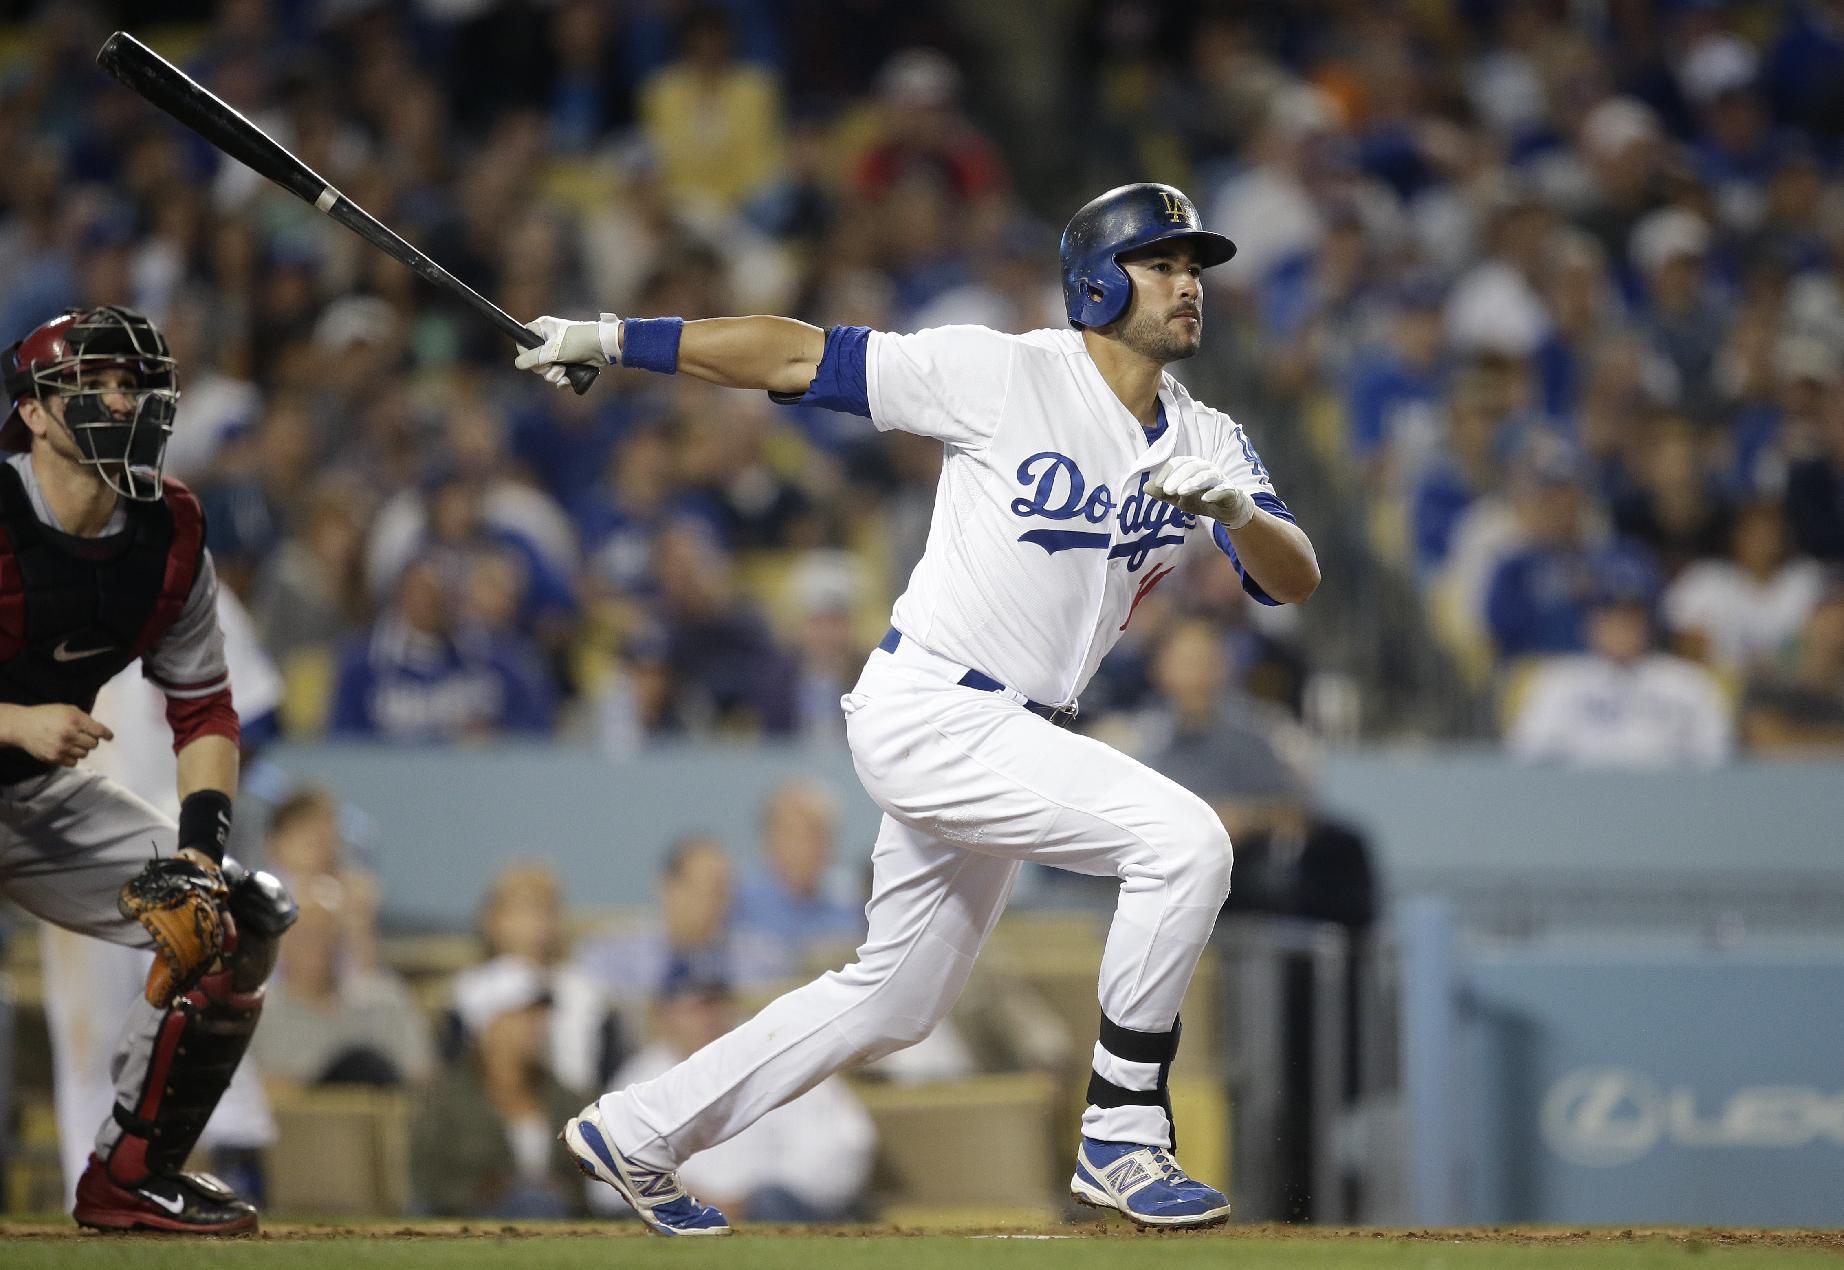 Dodgers beat Diamondbacks 5-3 in 11 innings